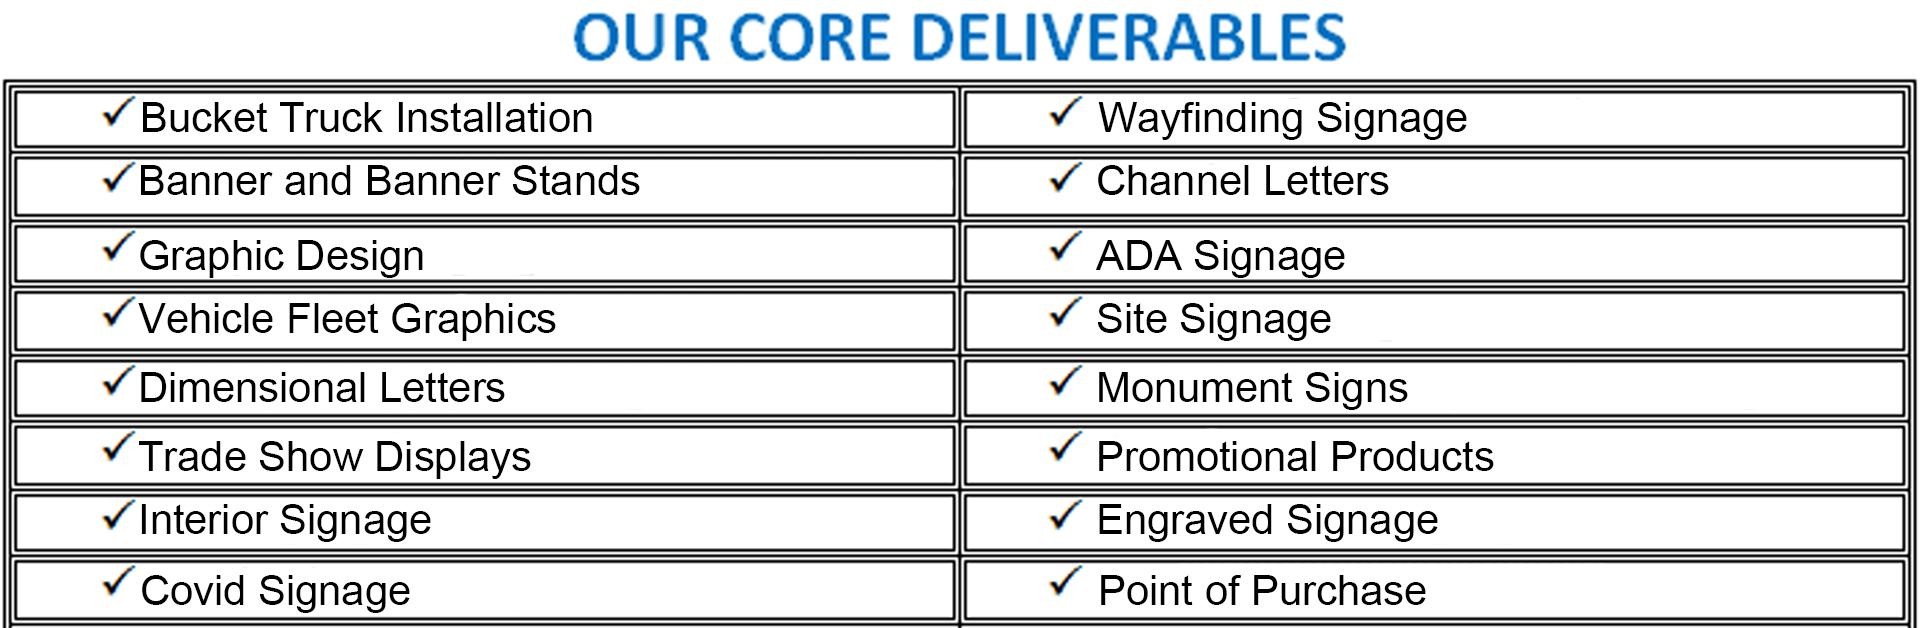 248 - Deliverables